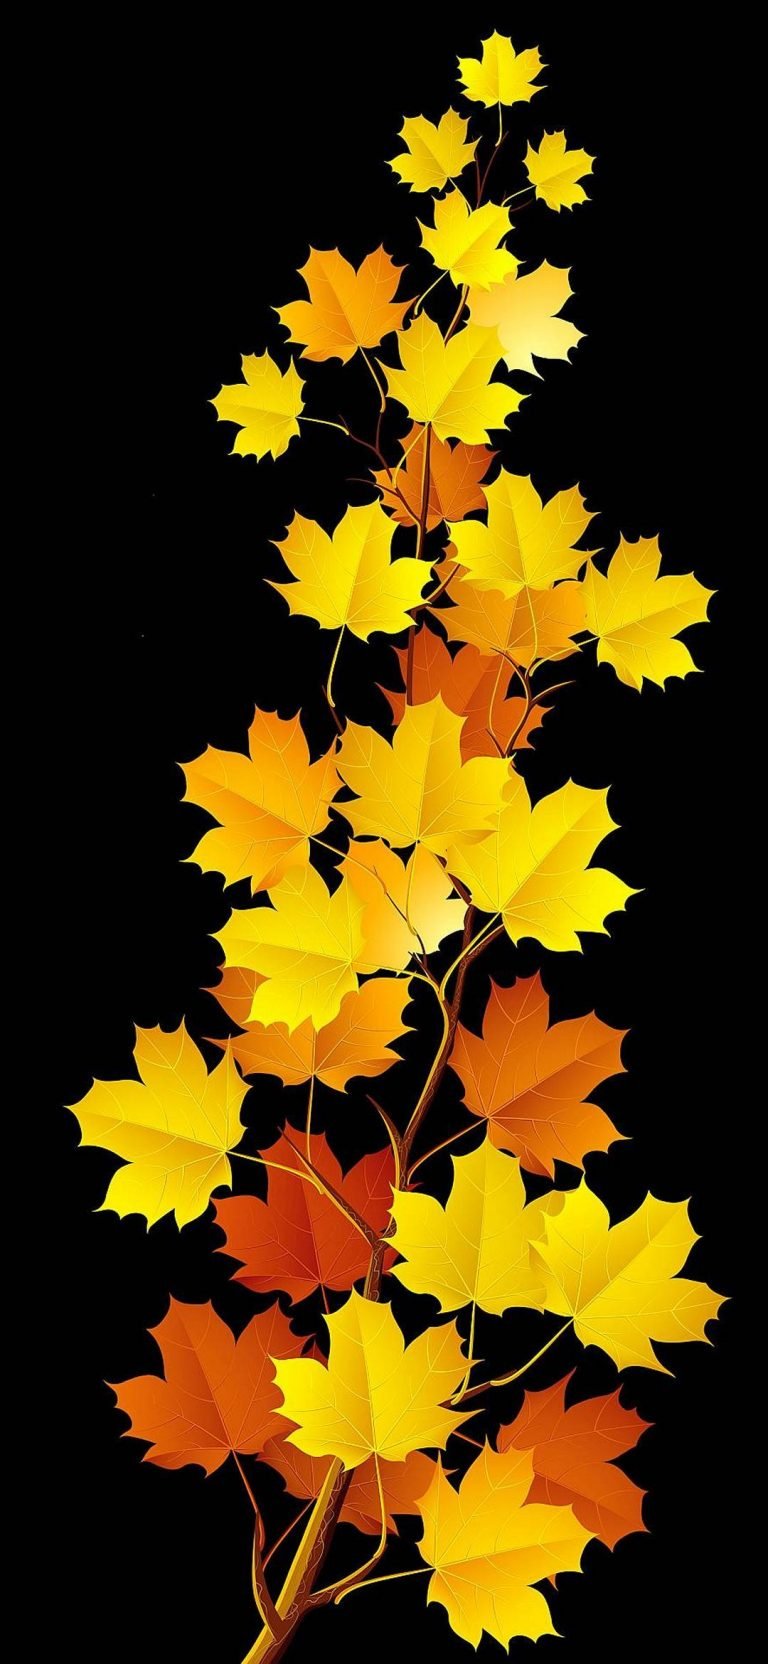 Autumn Phone Wallpaper 058 768x1664